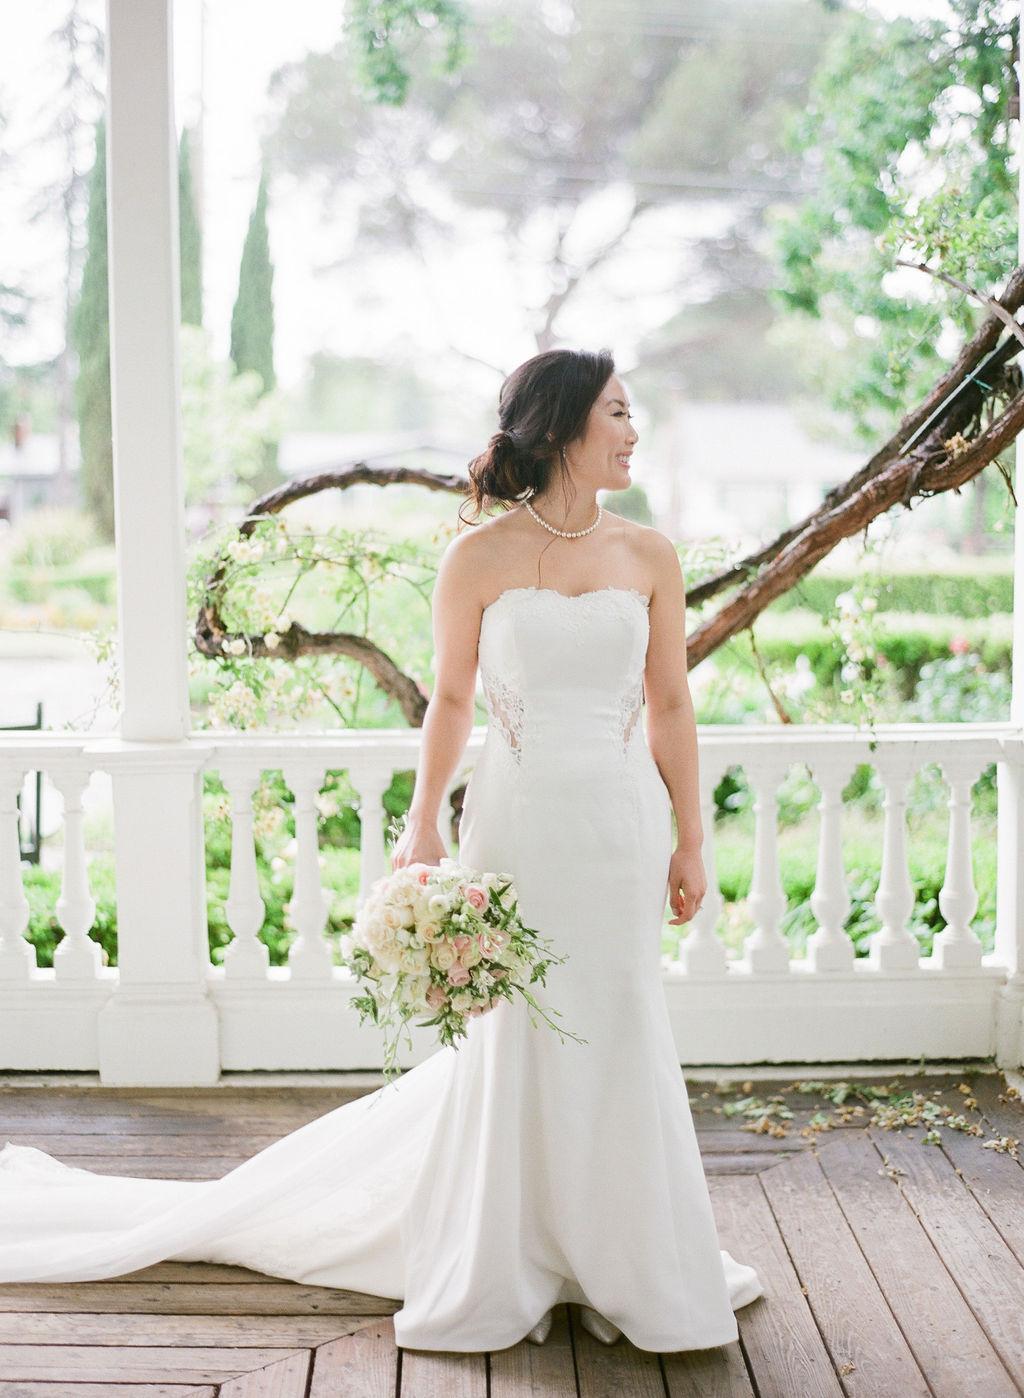 [2]JennySoiPhotography-KearaandWillRamekinsSonomaWedding-101.jpgRamekins Sonoma Wedding Fine Art Wedding Photographer.jpg